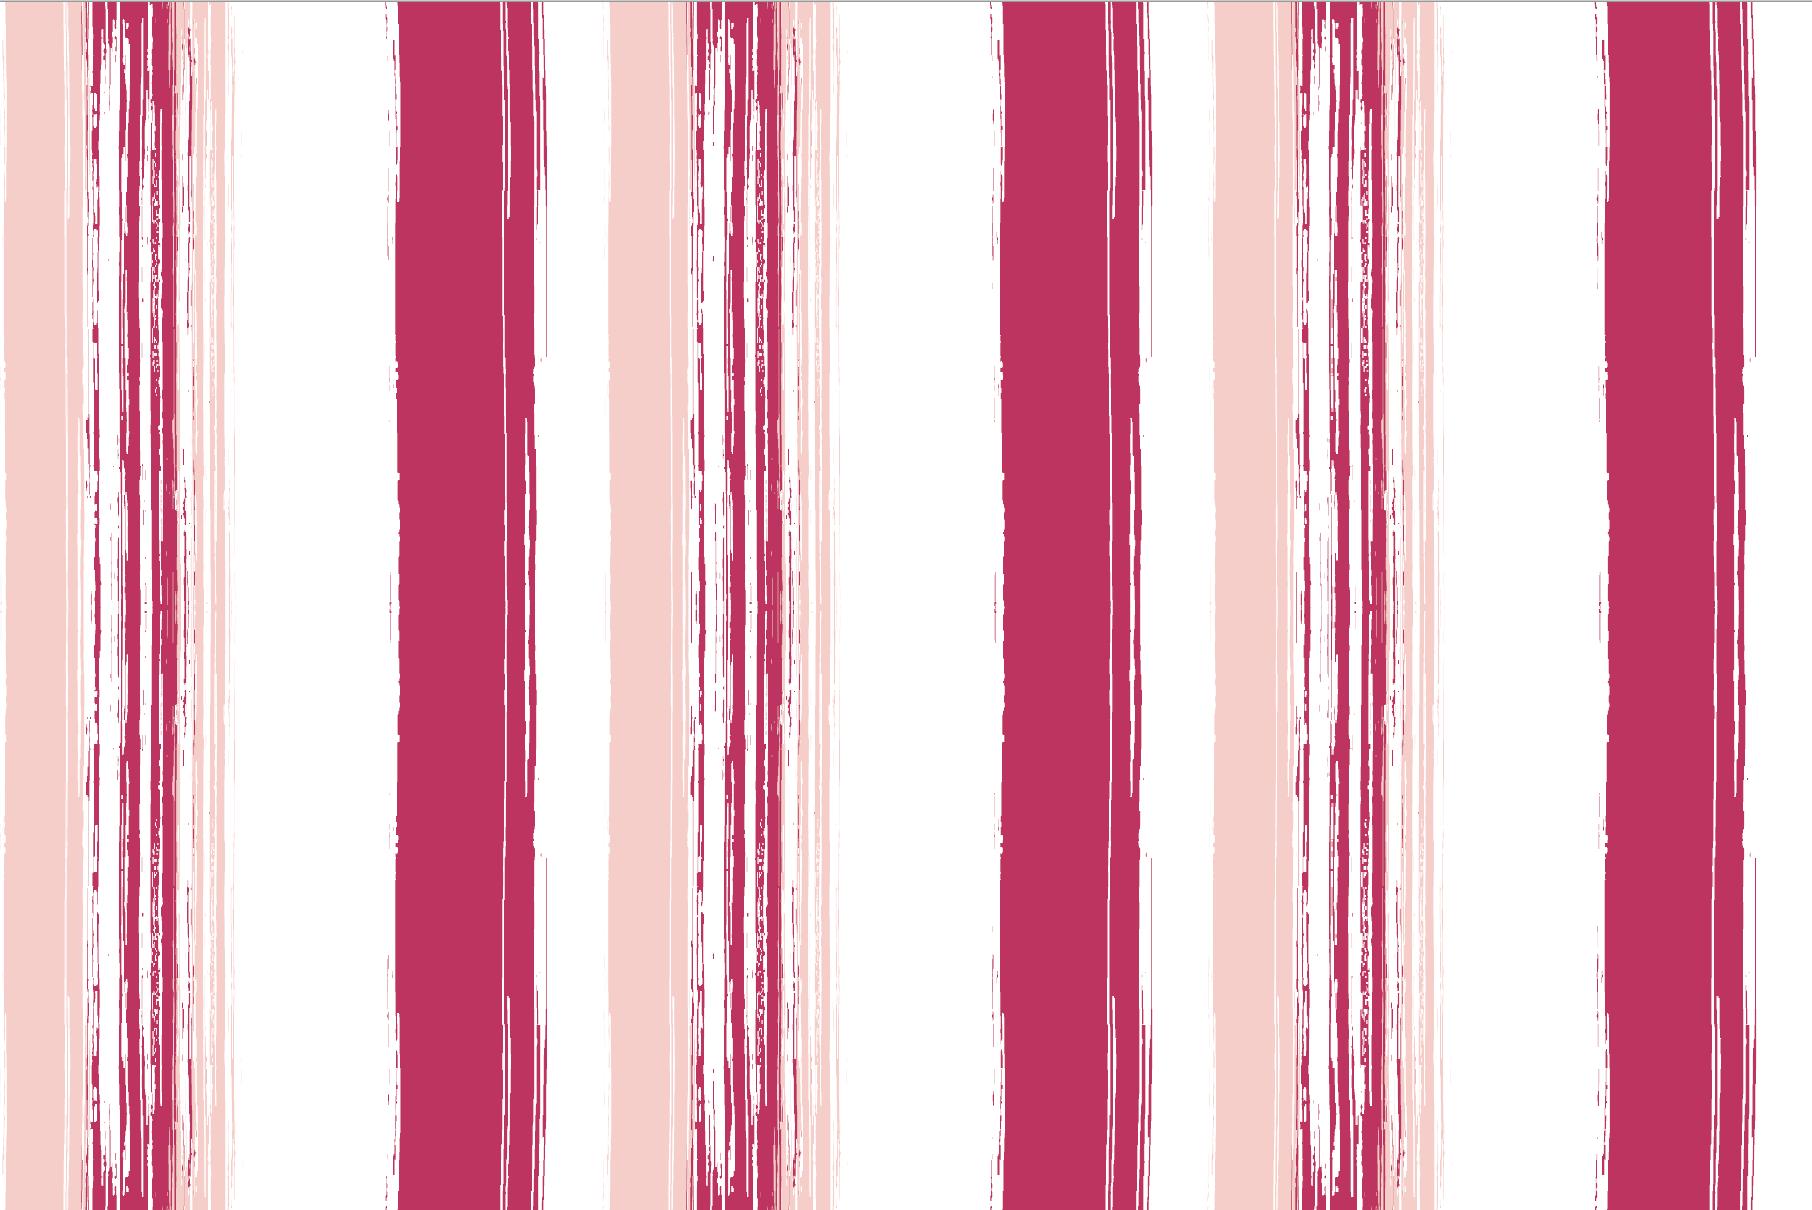 Raspberry/Blush Pink